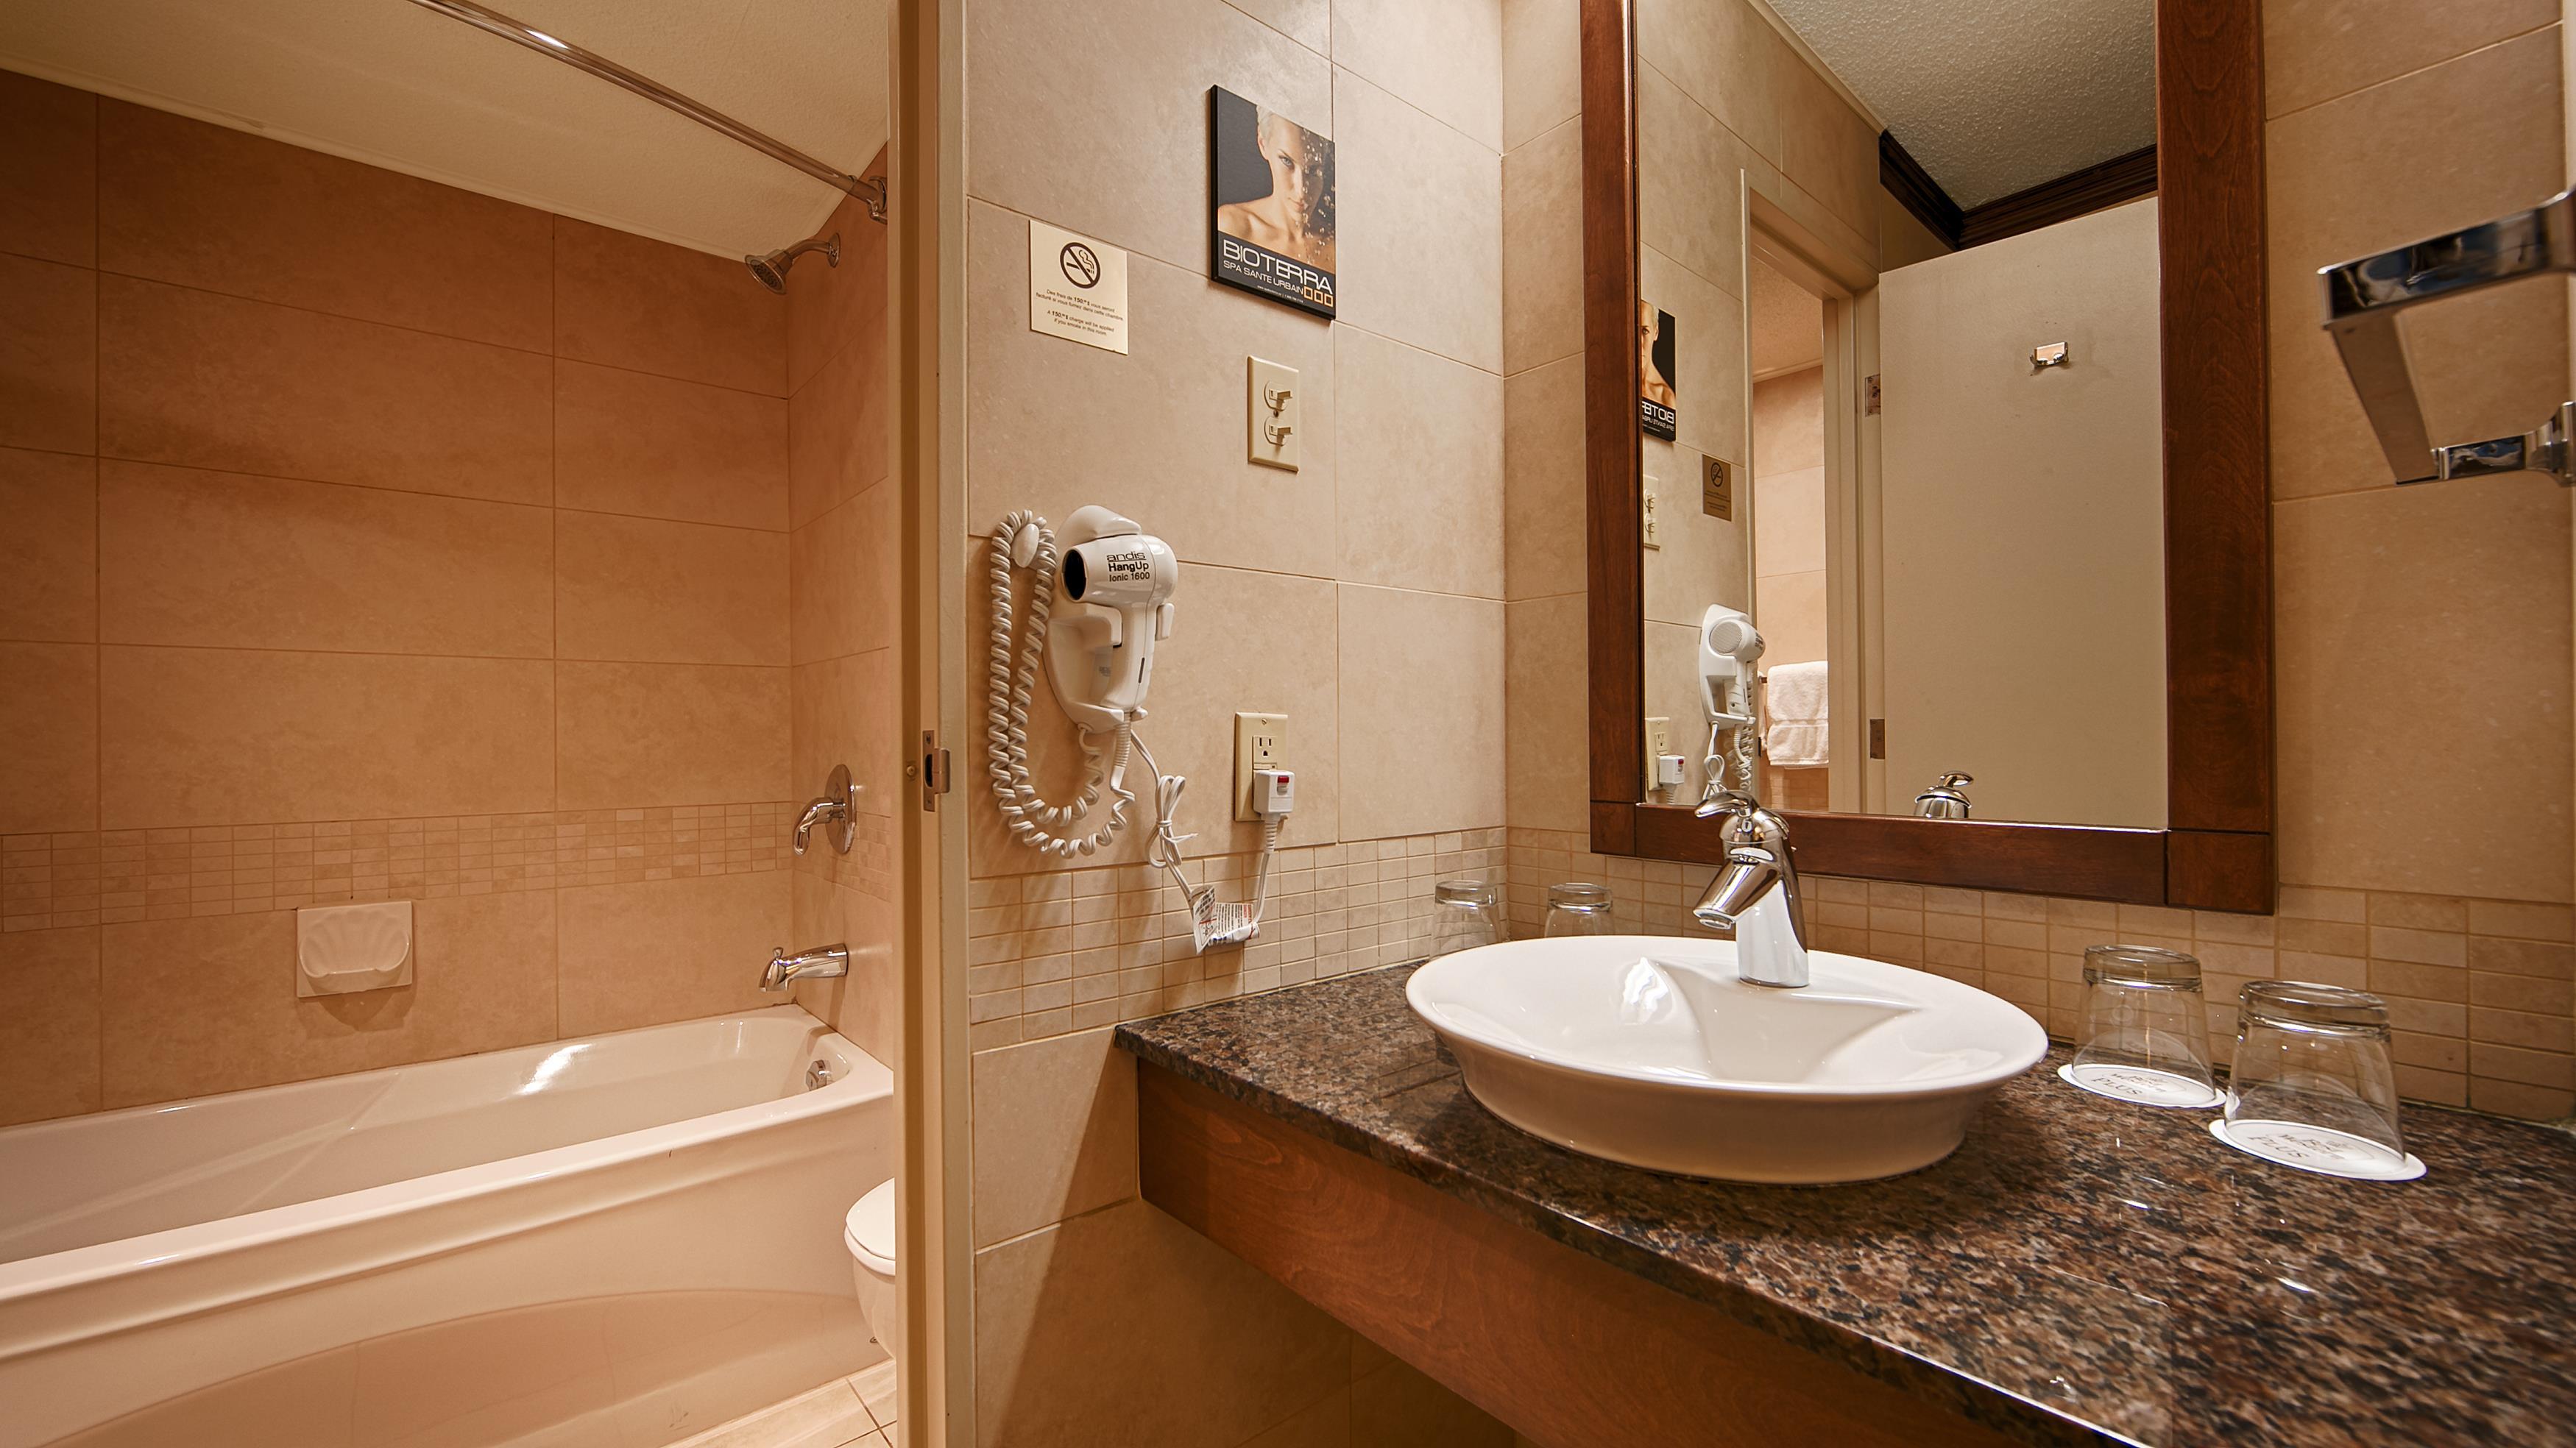 Best Western Hotel Universel Drummondville à Drummondville: Guest Bathroom